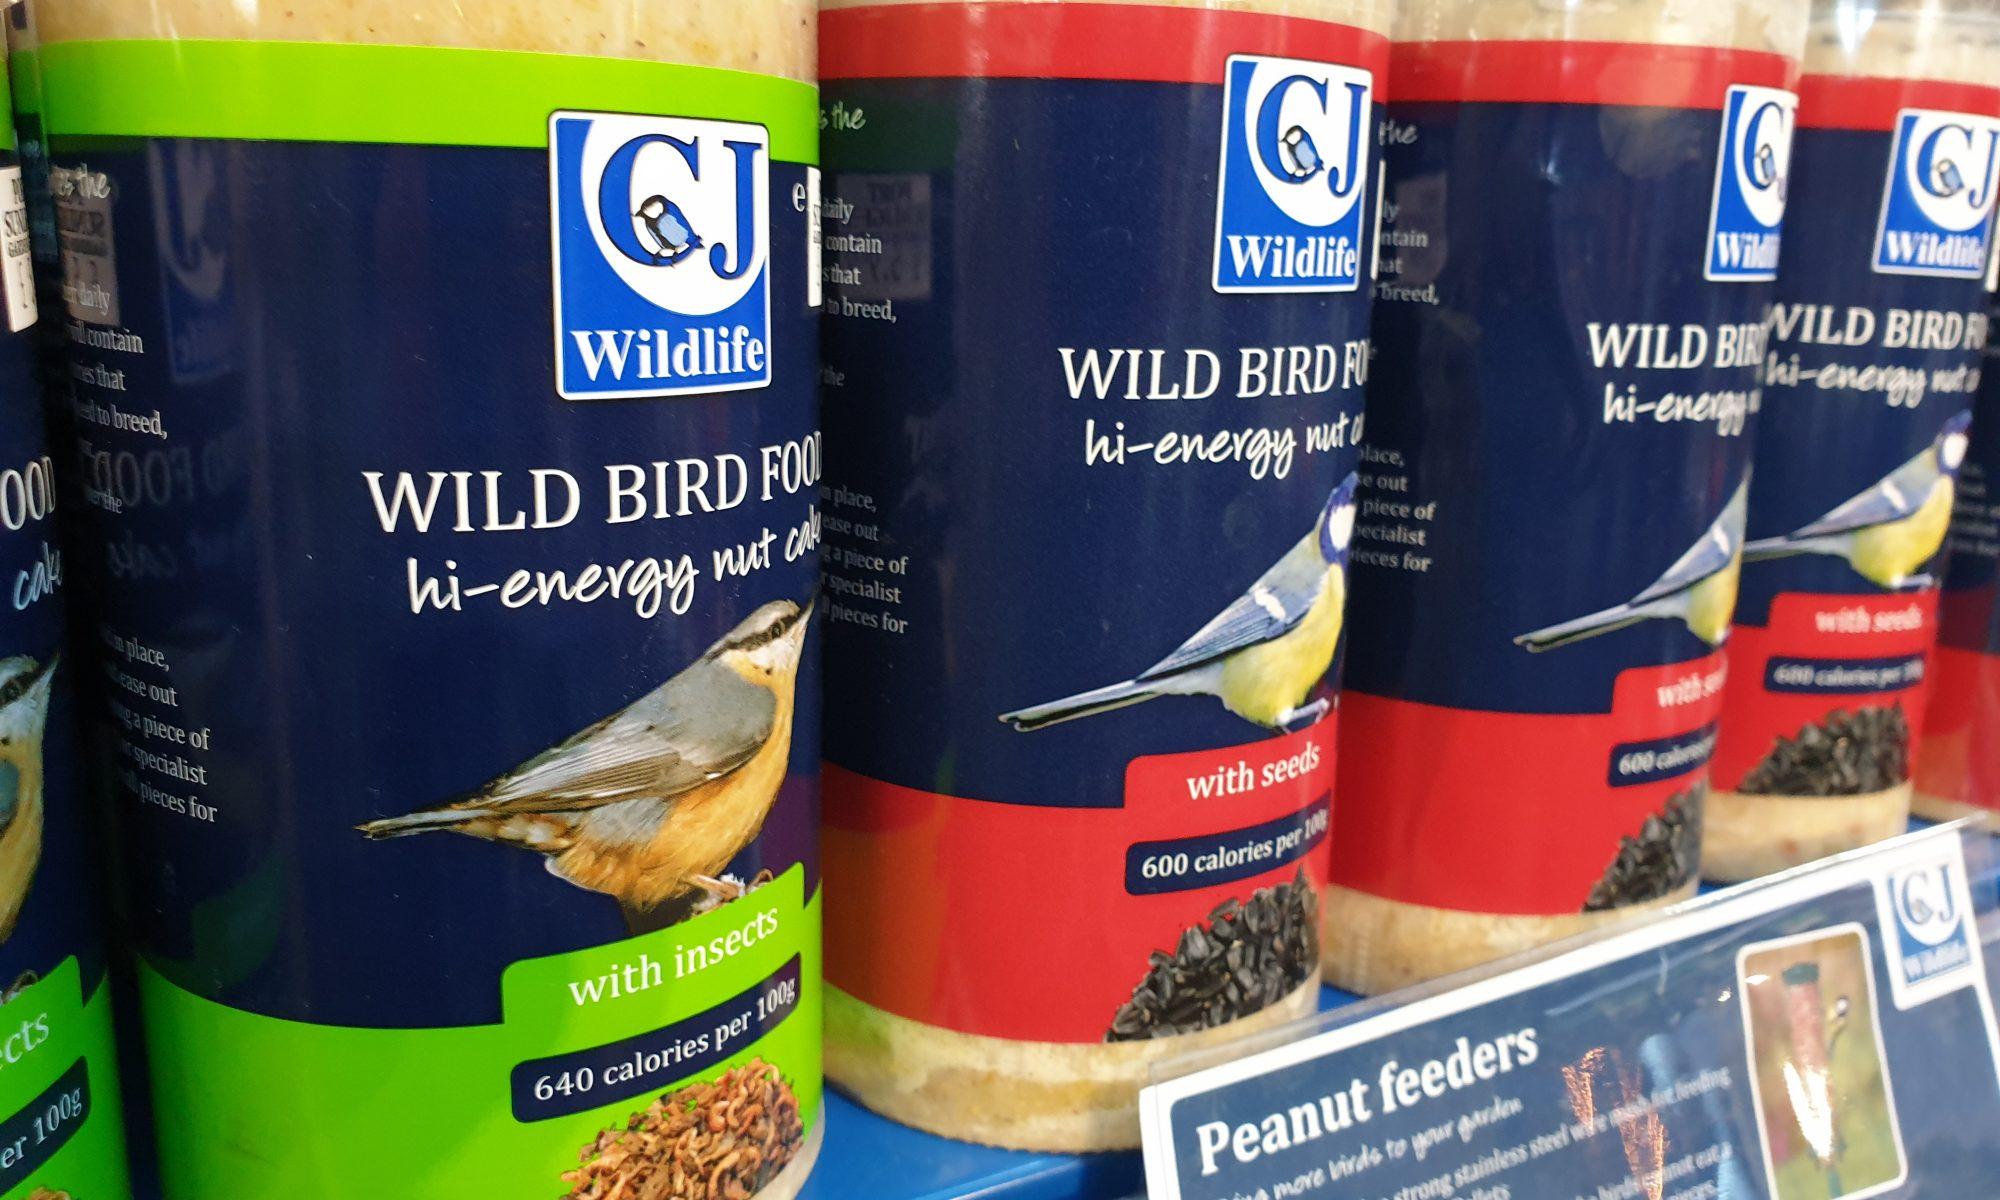 Hi energy food for wild birds